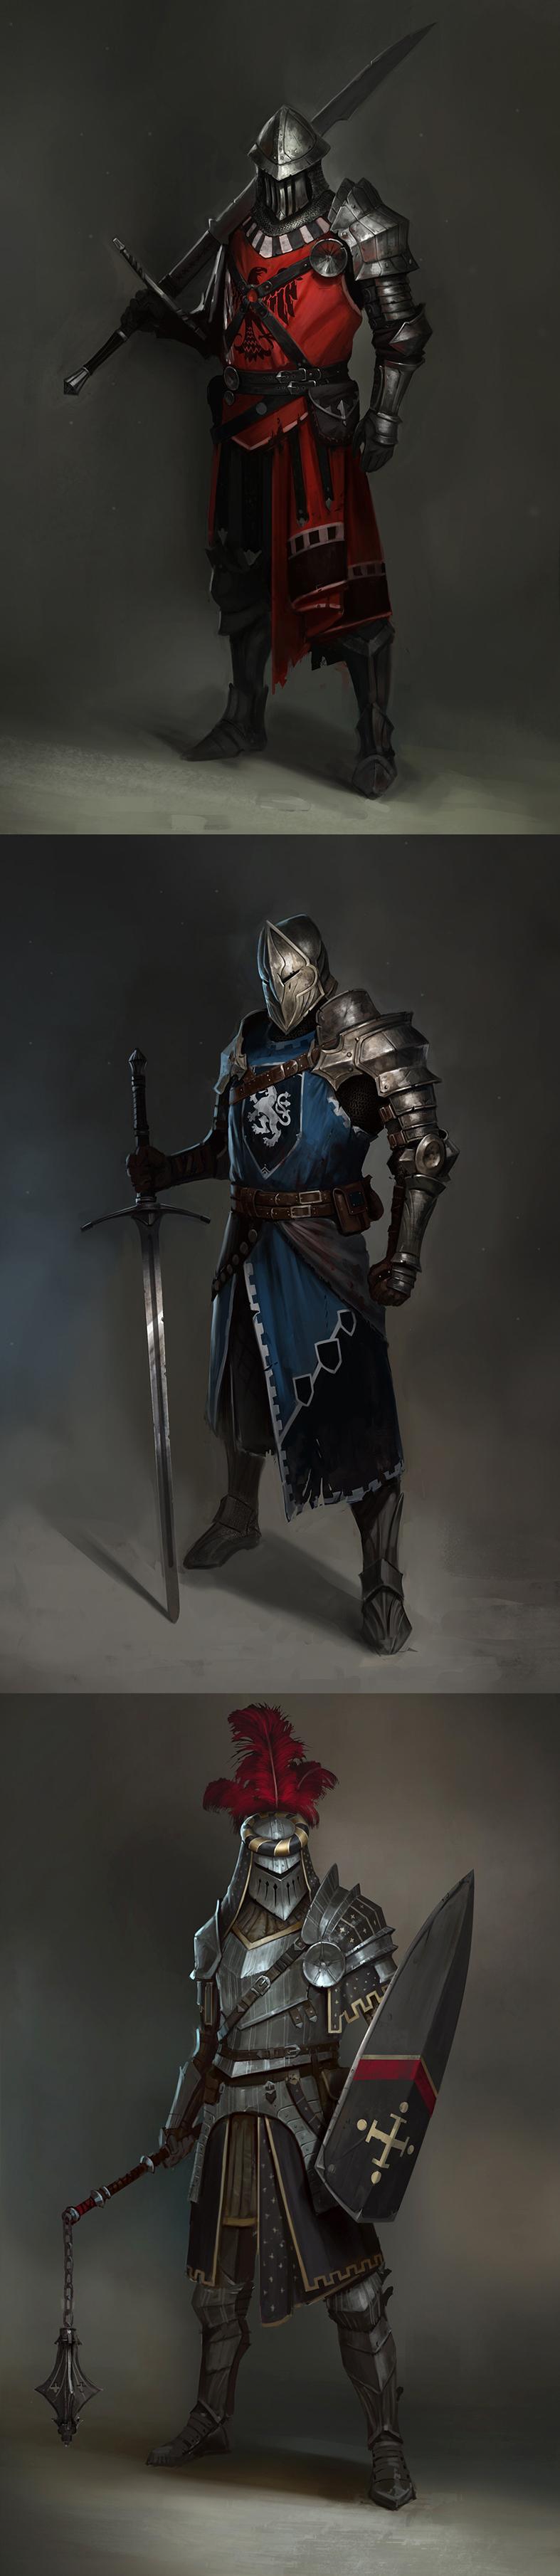 Knight by Vladimir Buchyk